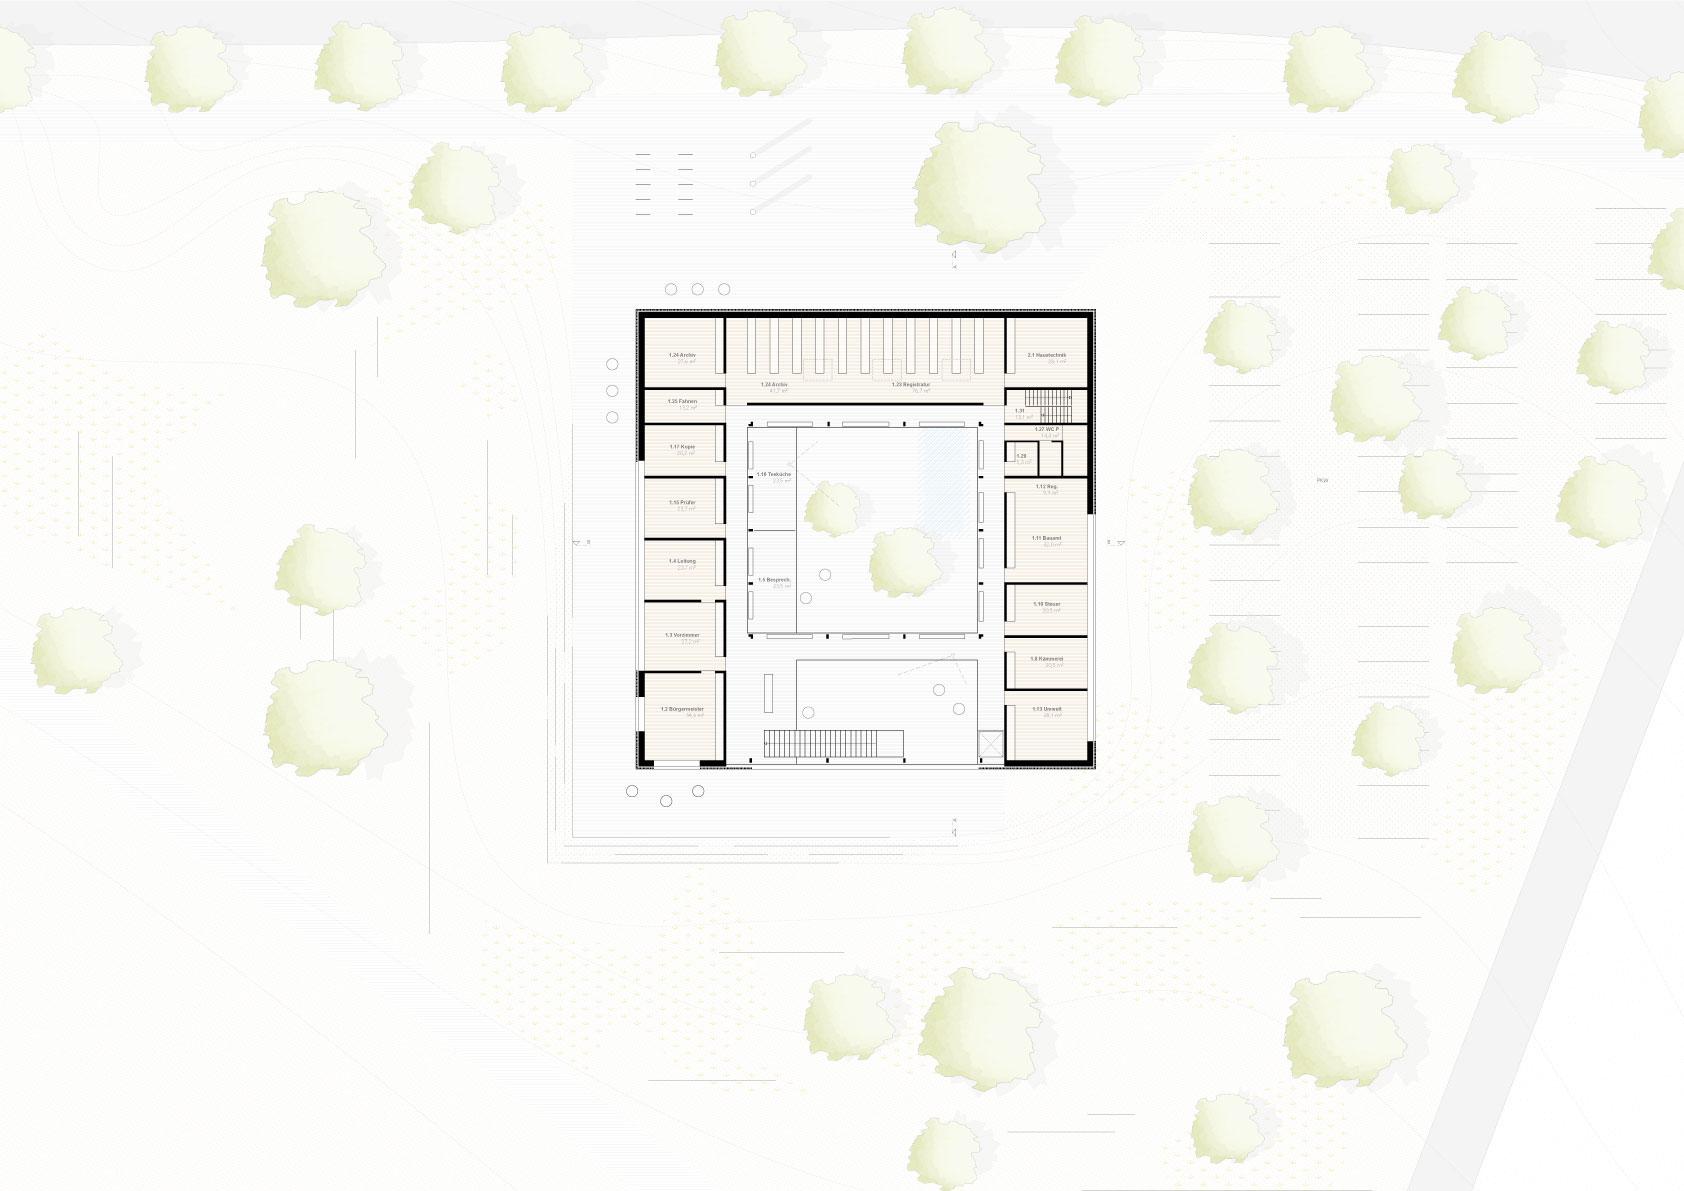 STUDIOKUBIK-KUBIK-architektur-architecture-berlin-RMP-skizze-erdgeschoss-ground-floor